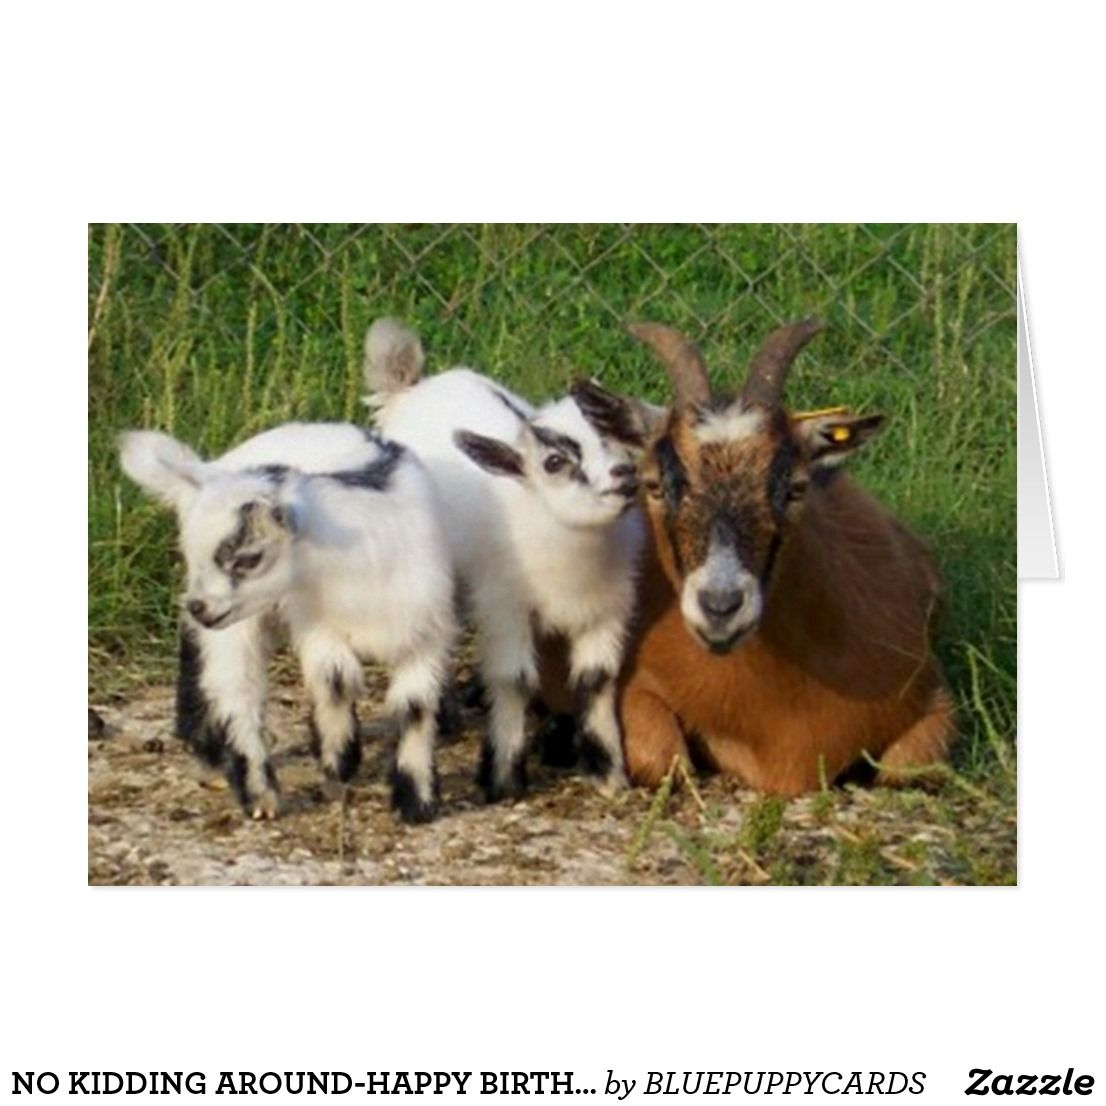 No kidding around happy birthday card greeting cards and more no kidding around happy birthday card bookmarktalkfo Image collections